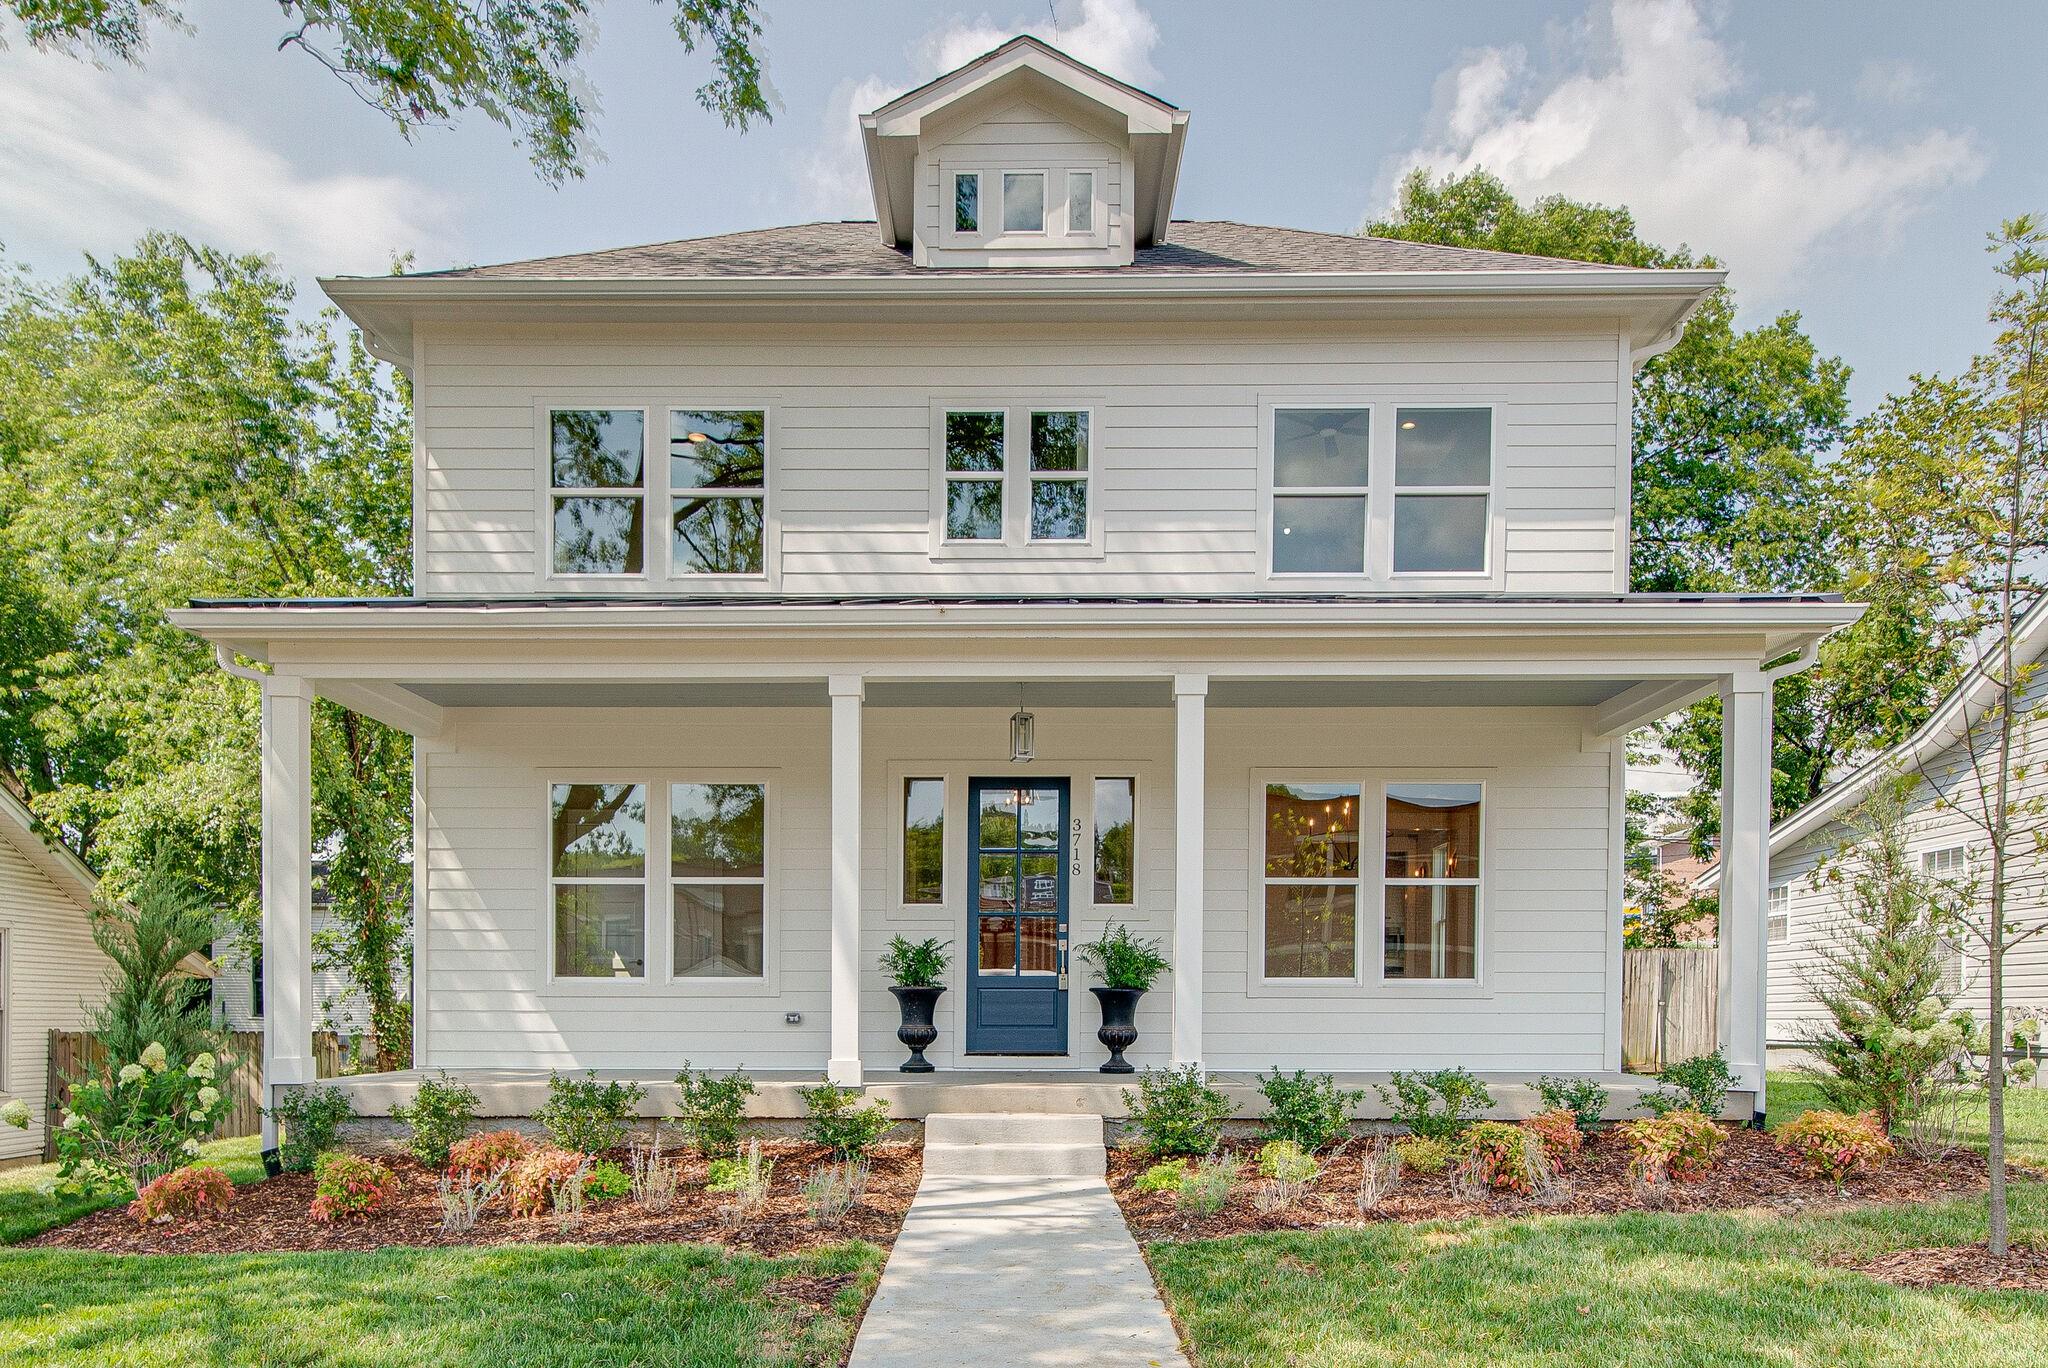 3718 Park Ave Property Photo - Nashville, TN real estate listing